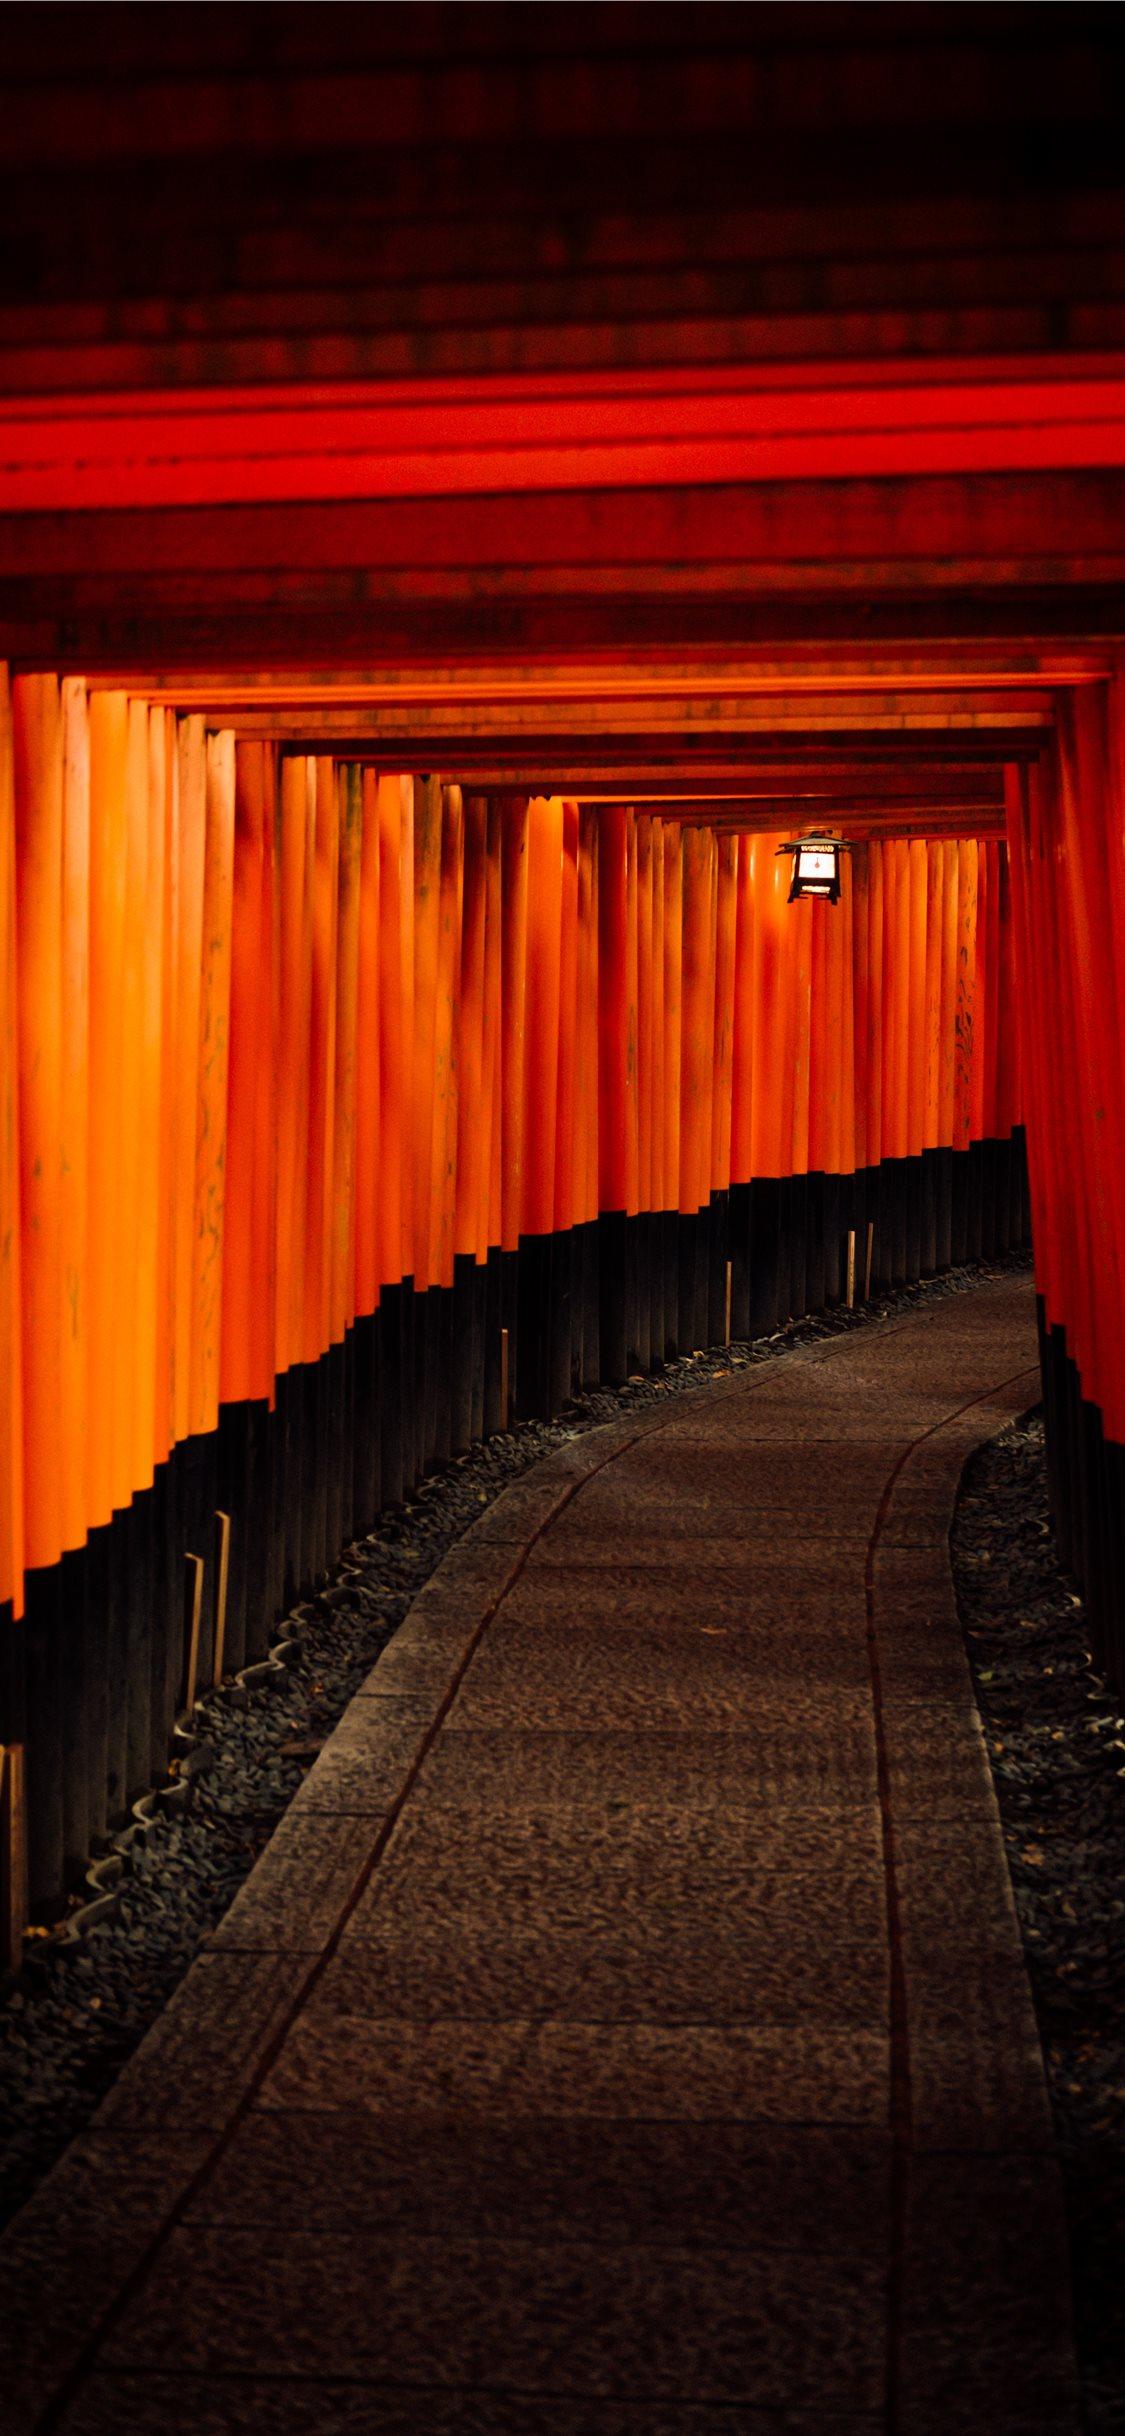 Fushimi inari taisha kyoto japan iPhone X Wallpaper Download 1125x2436